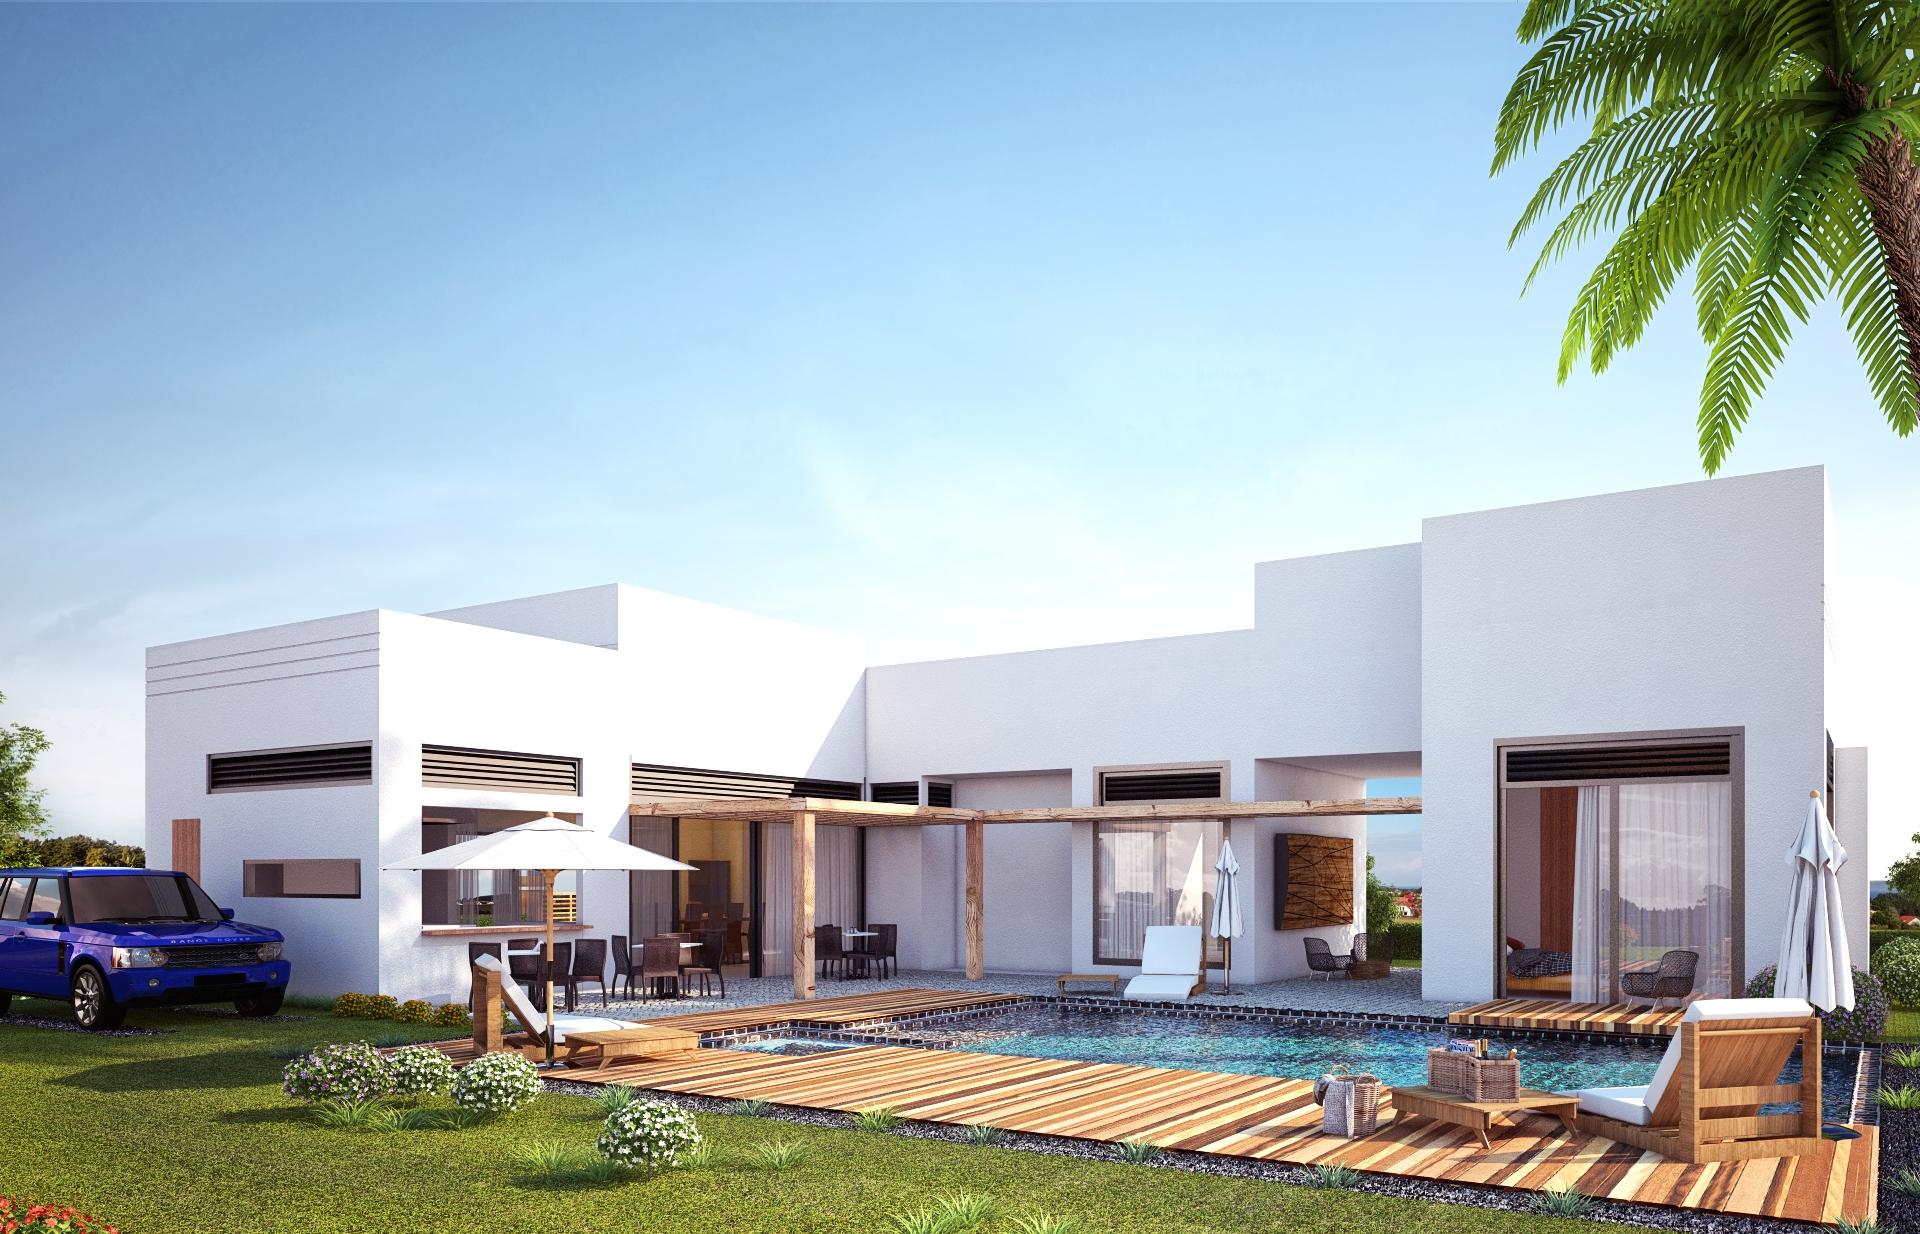 Exterior casa villeta - architecture - cristianebratt | ello